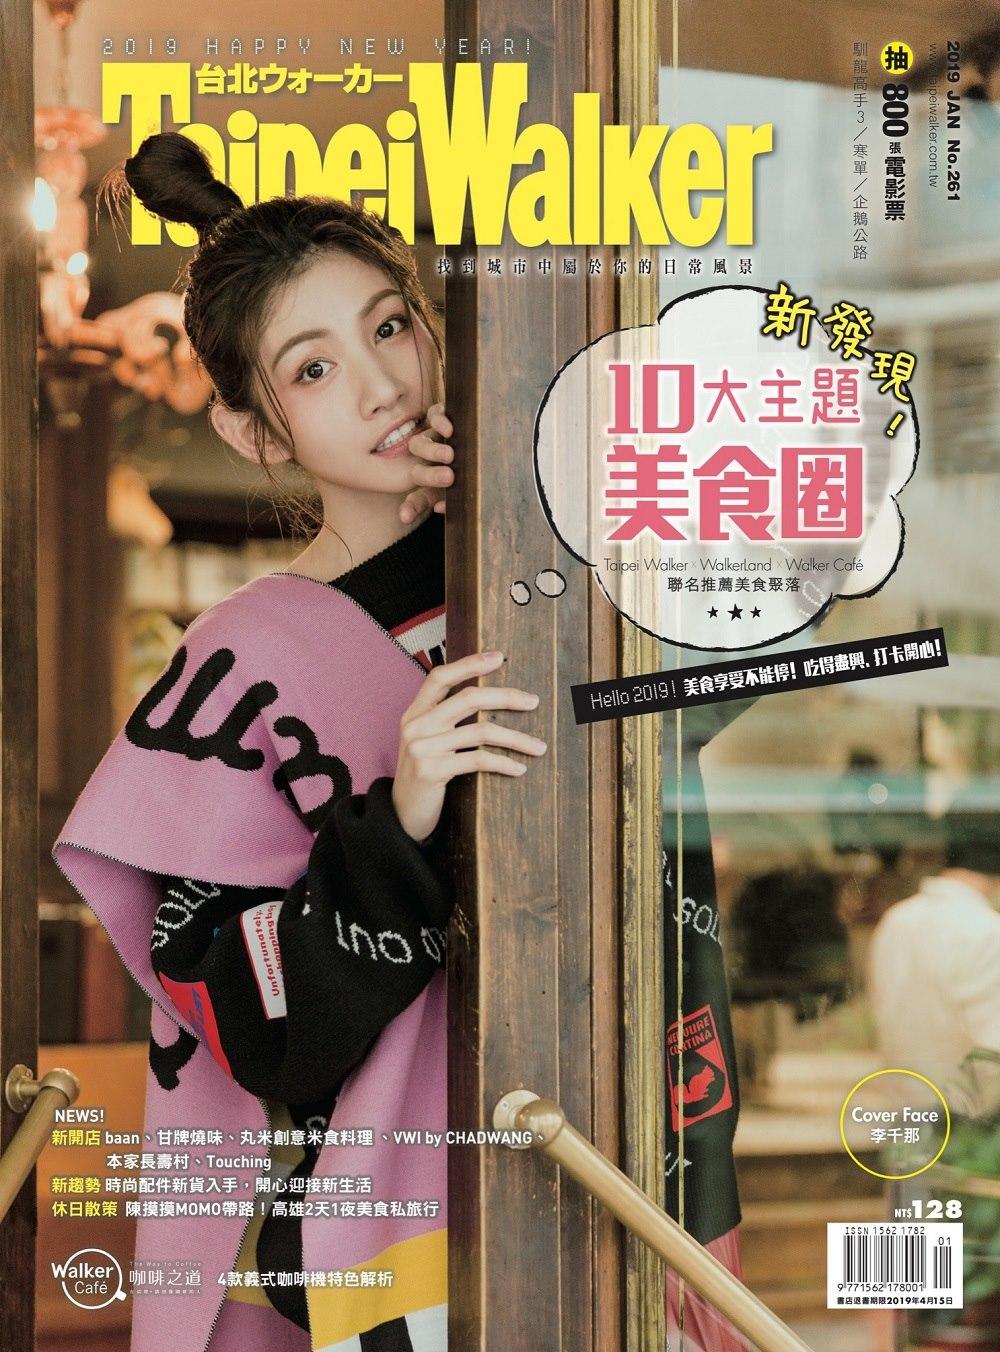 Taipei Walker 1月號/2019 第261期 贈:OPPO R15 / R15Pro 通用玻璃保護貼